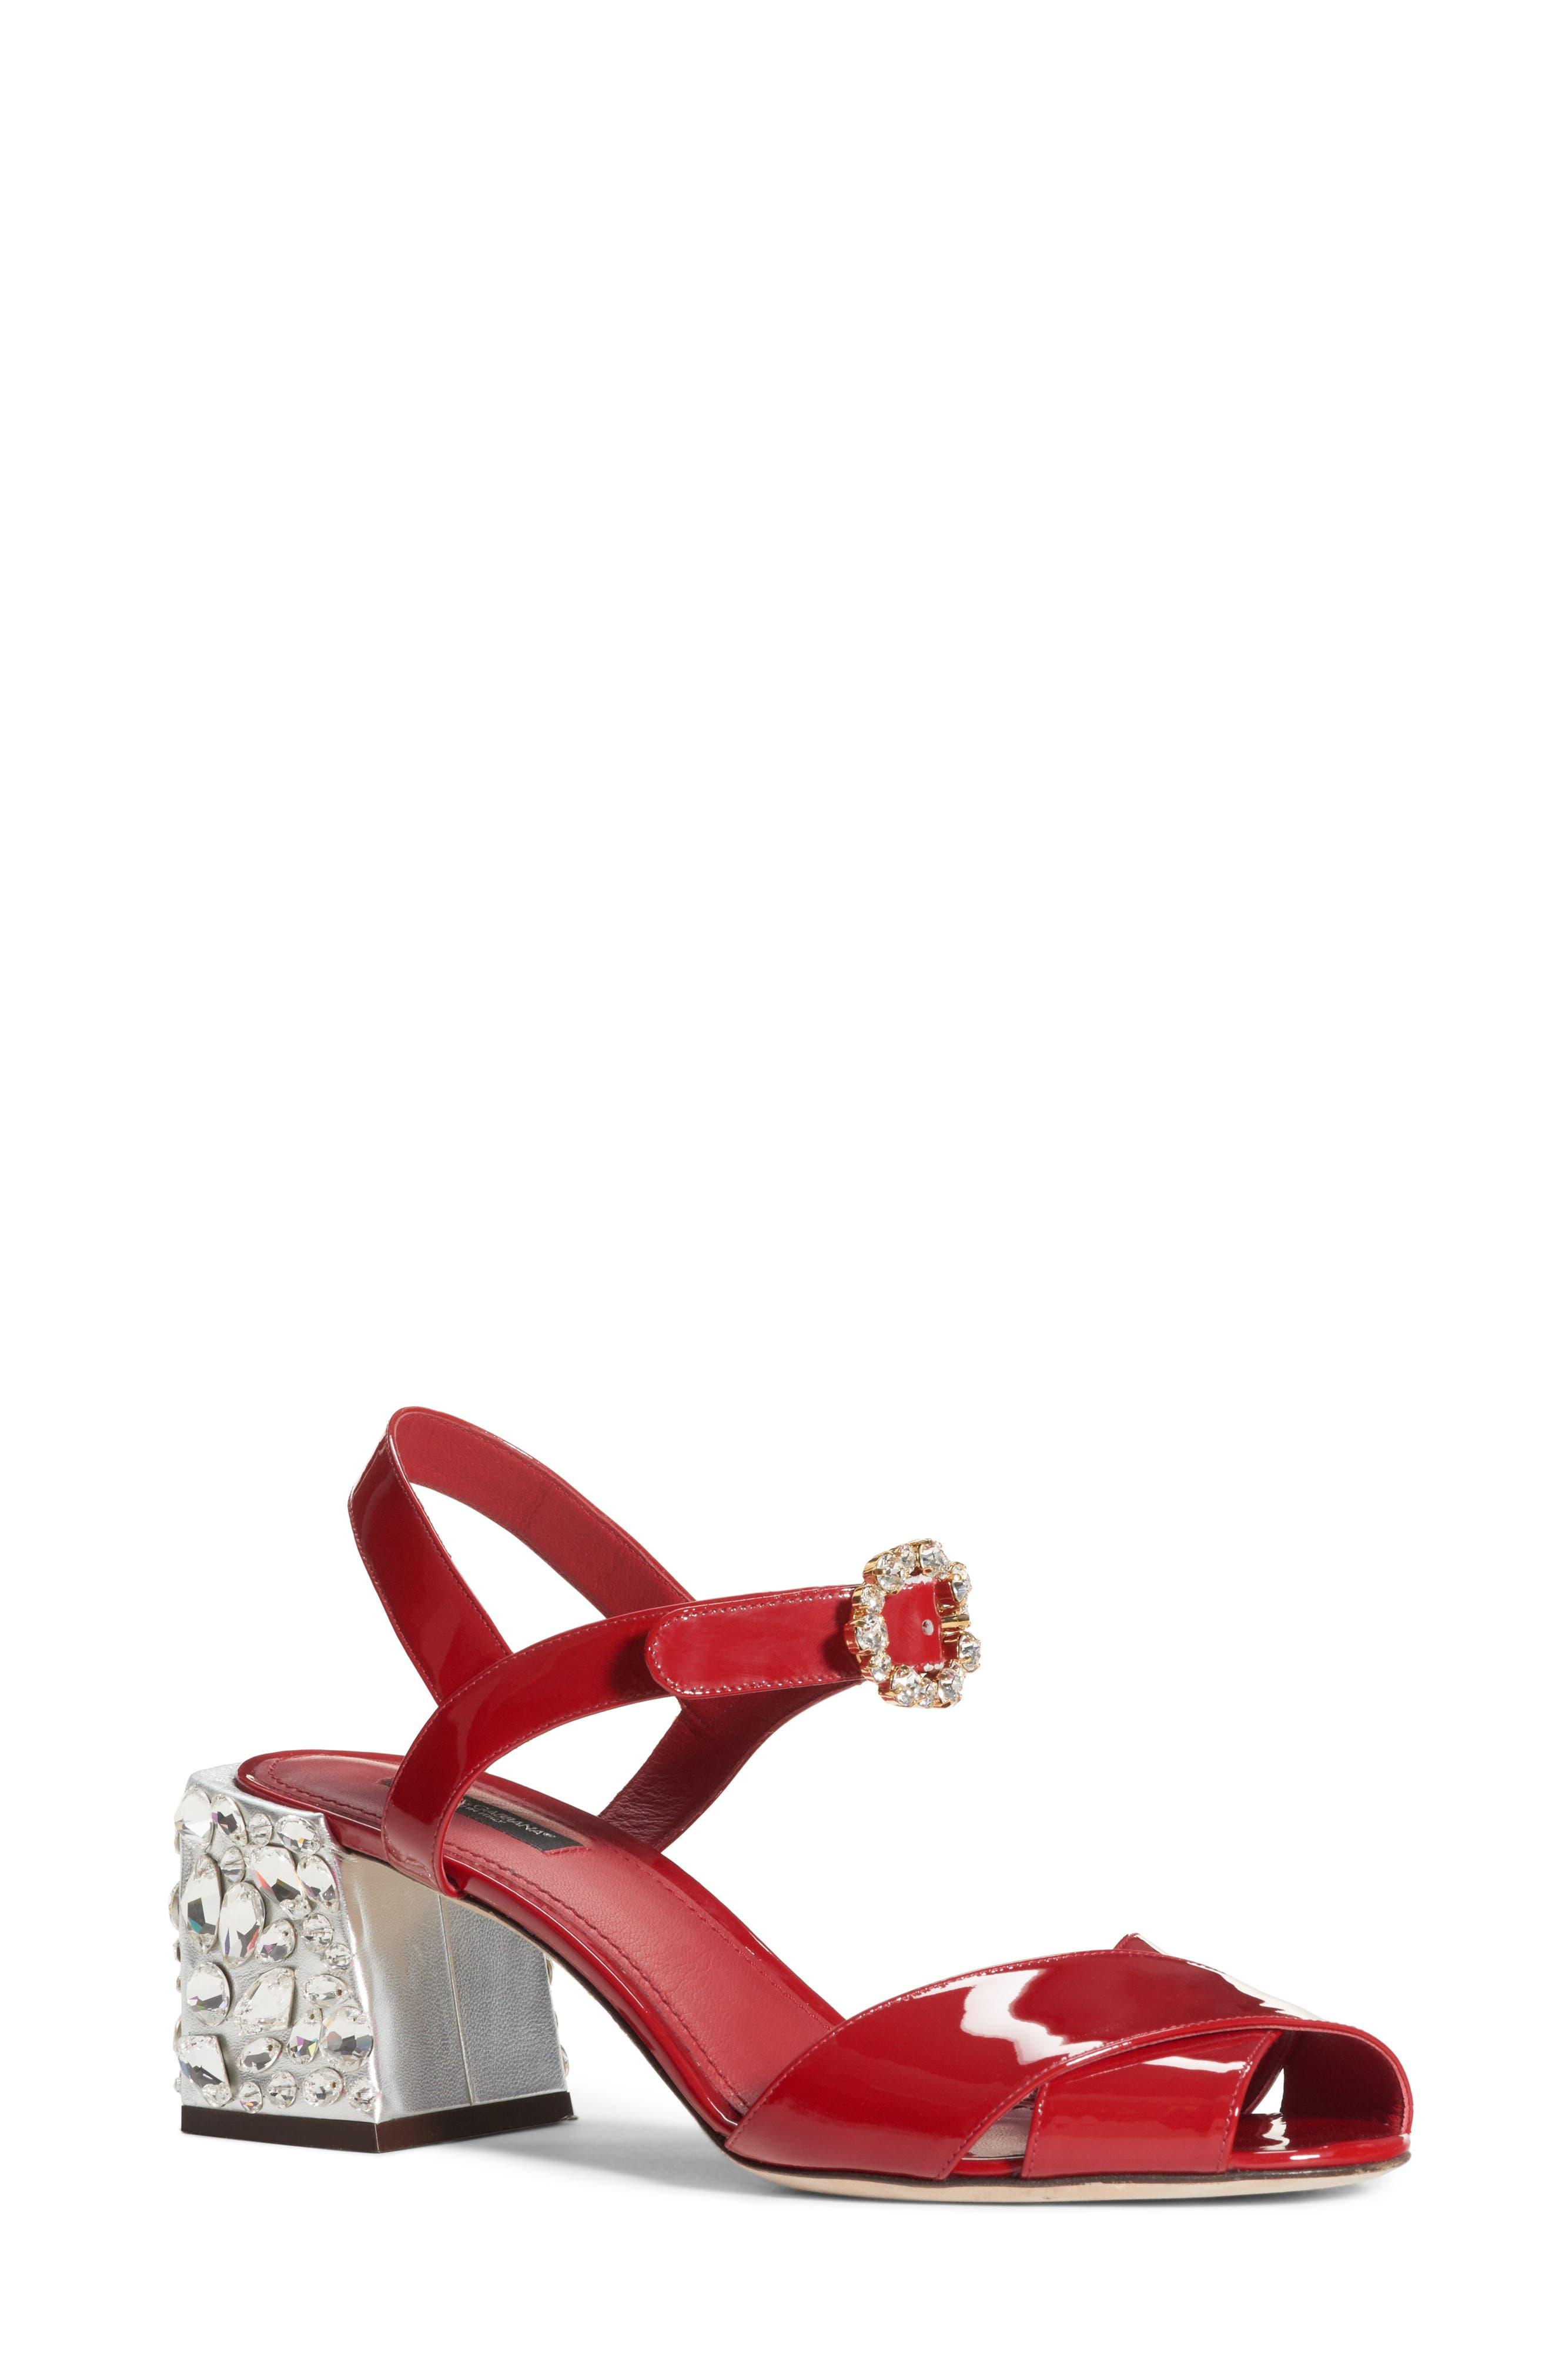 Main Image - Dolce&Gabbana Crystal Embellished Sandal (Women)